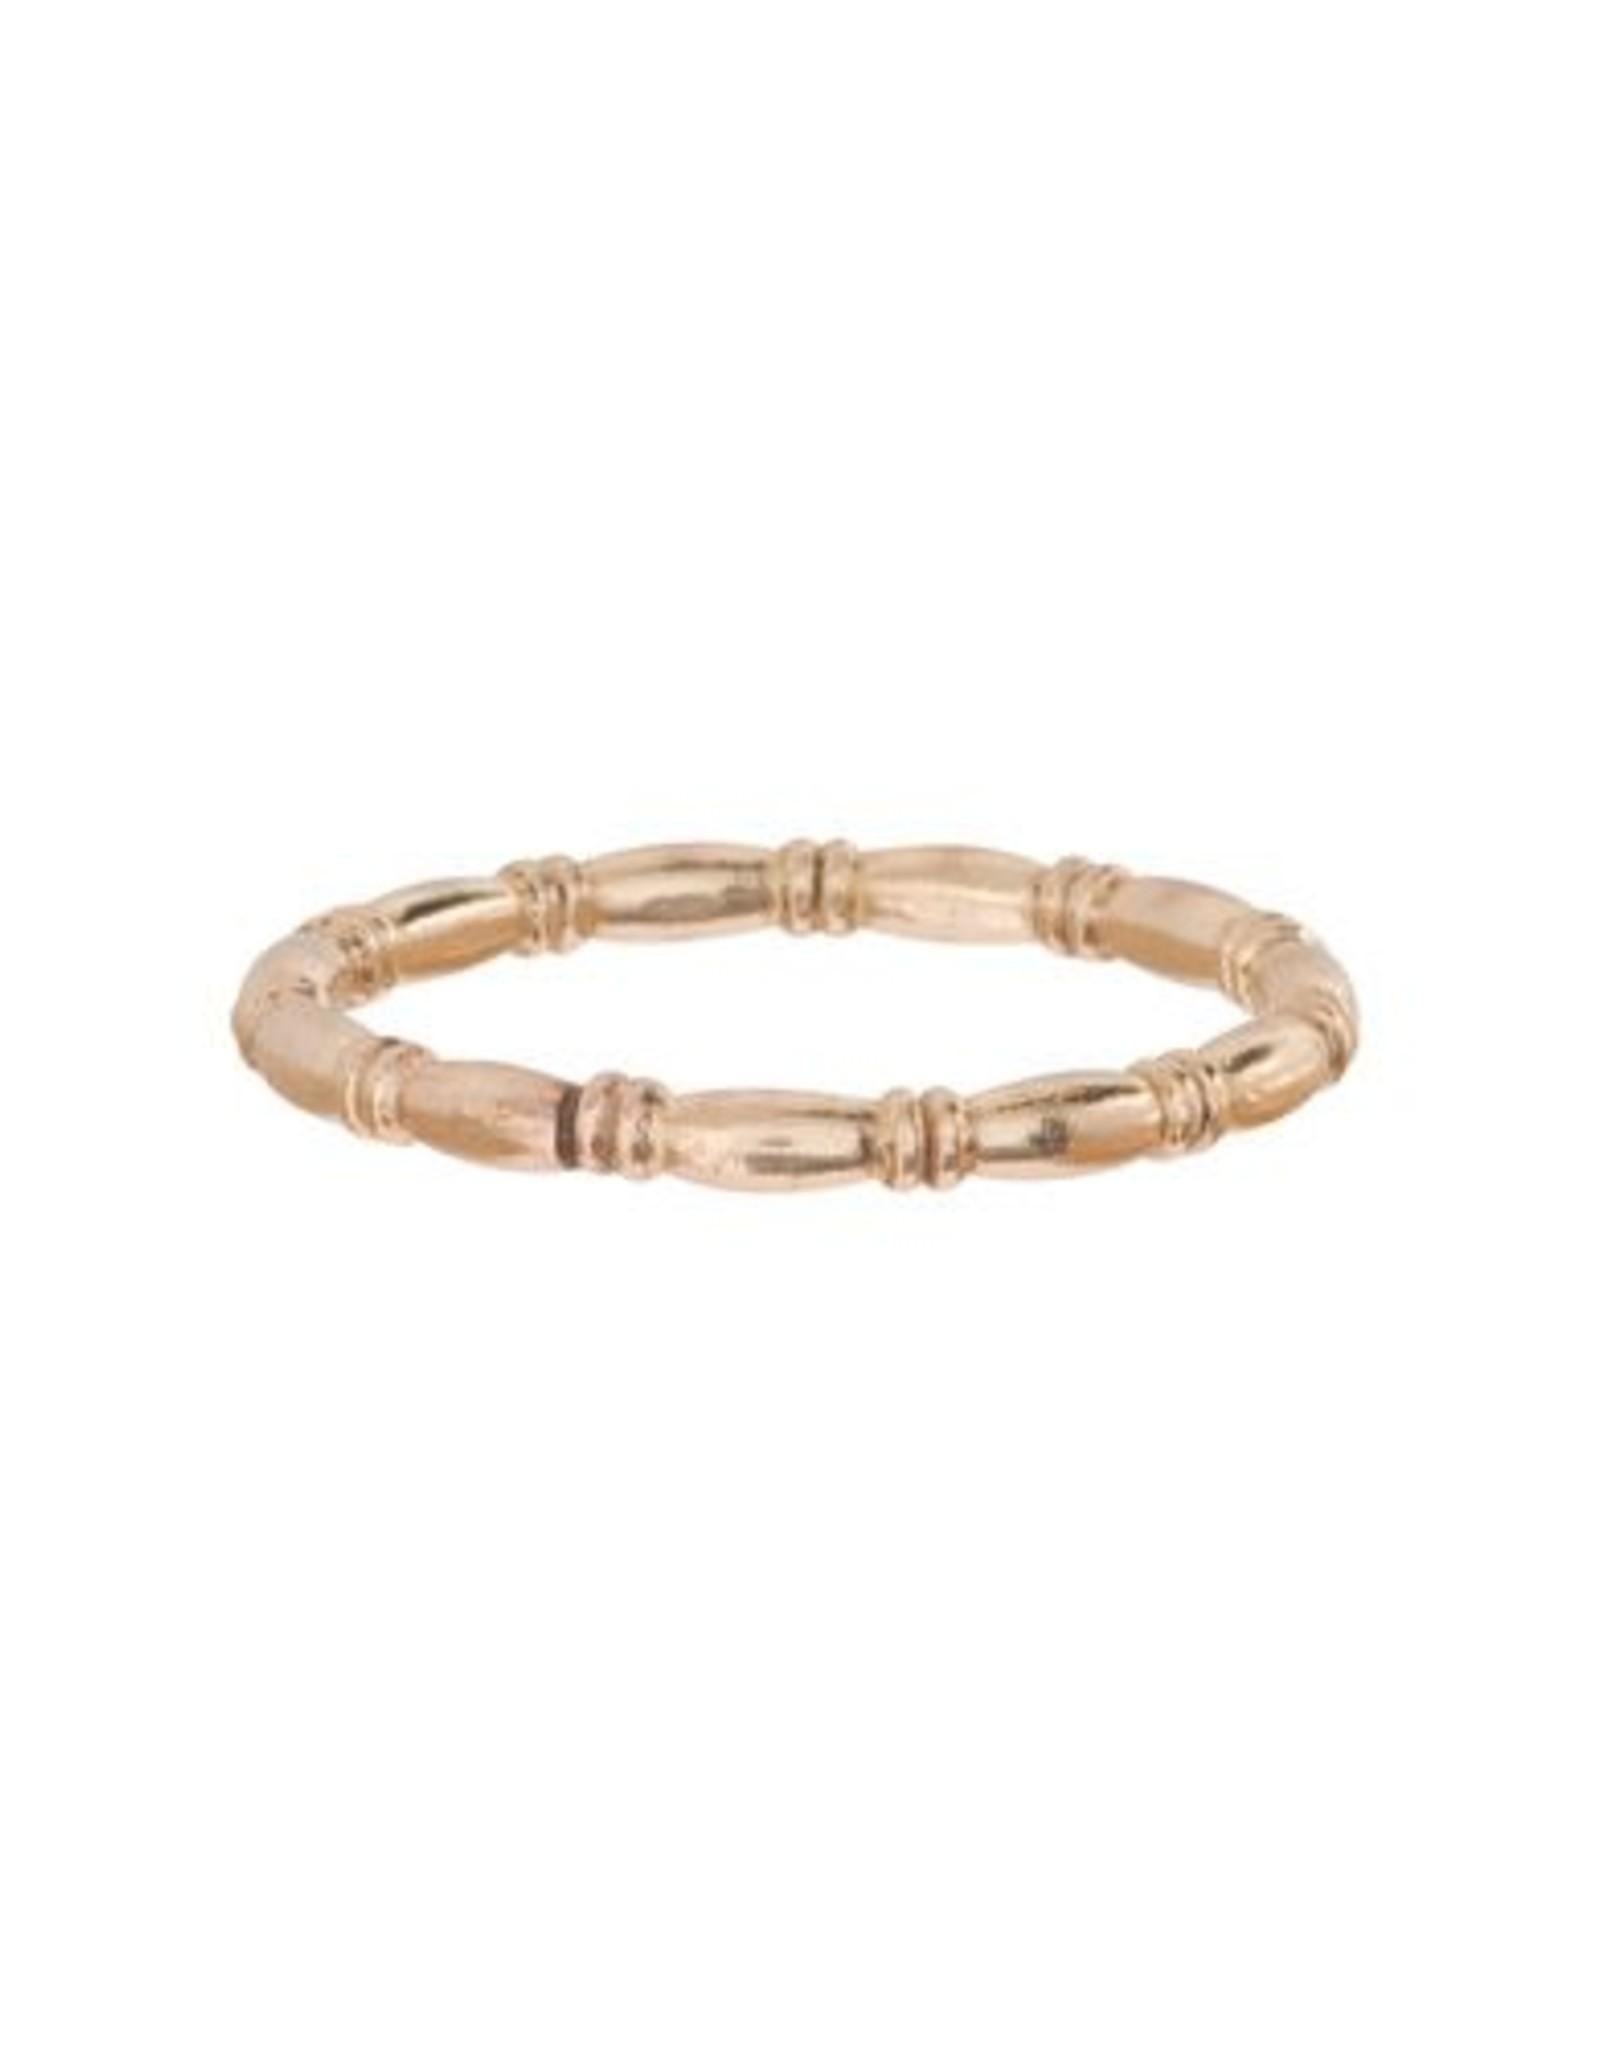 ENewton Design ENewton Designs- Harmony Gold Ring